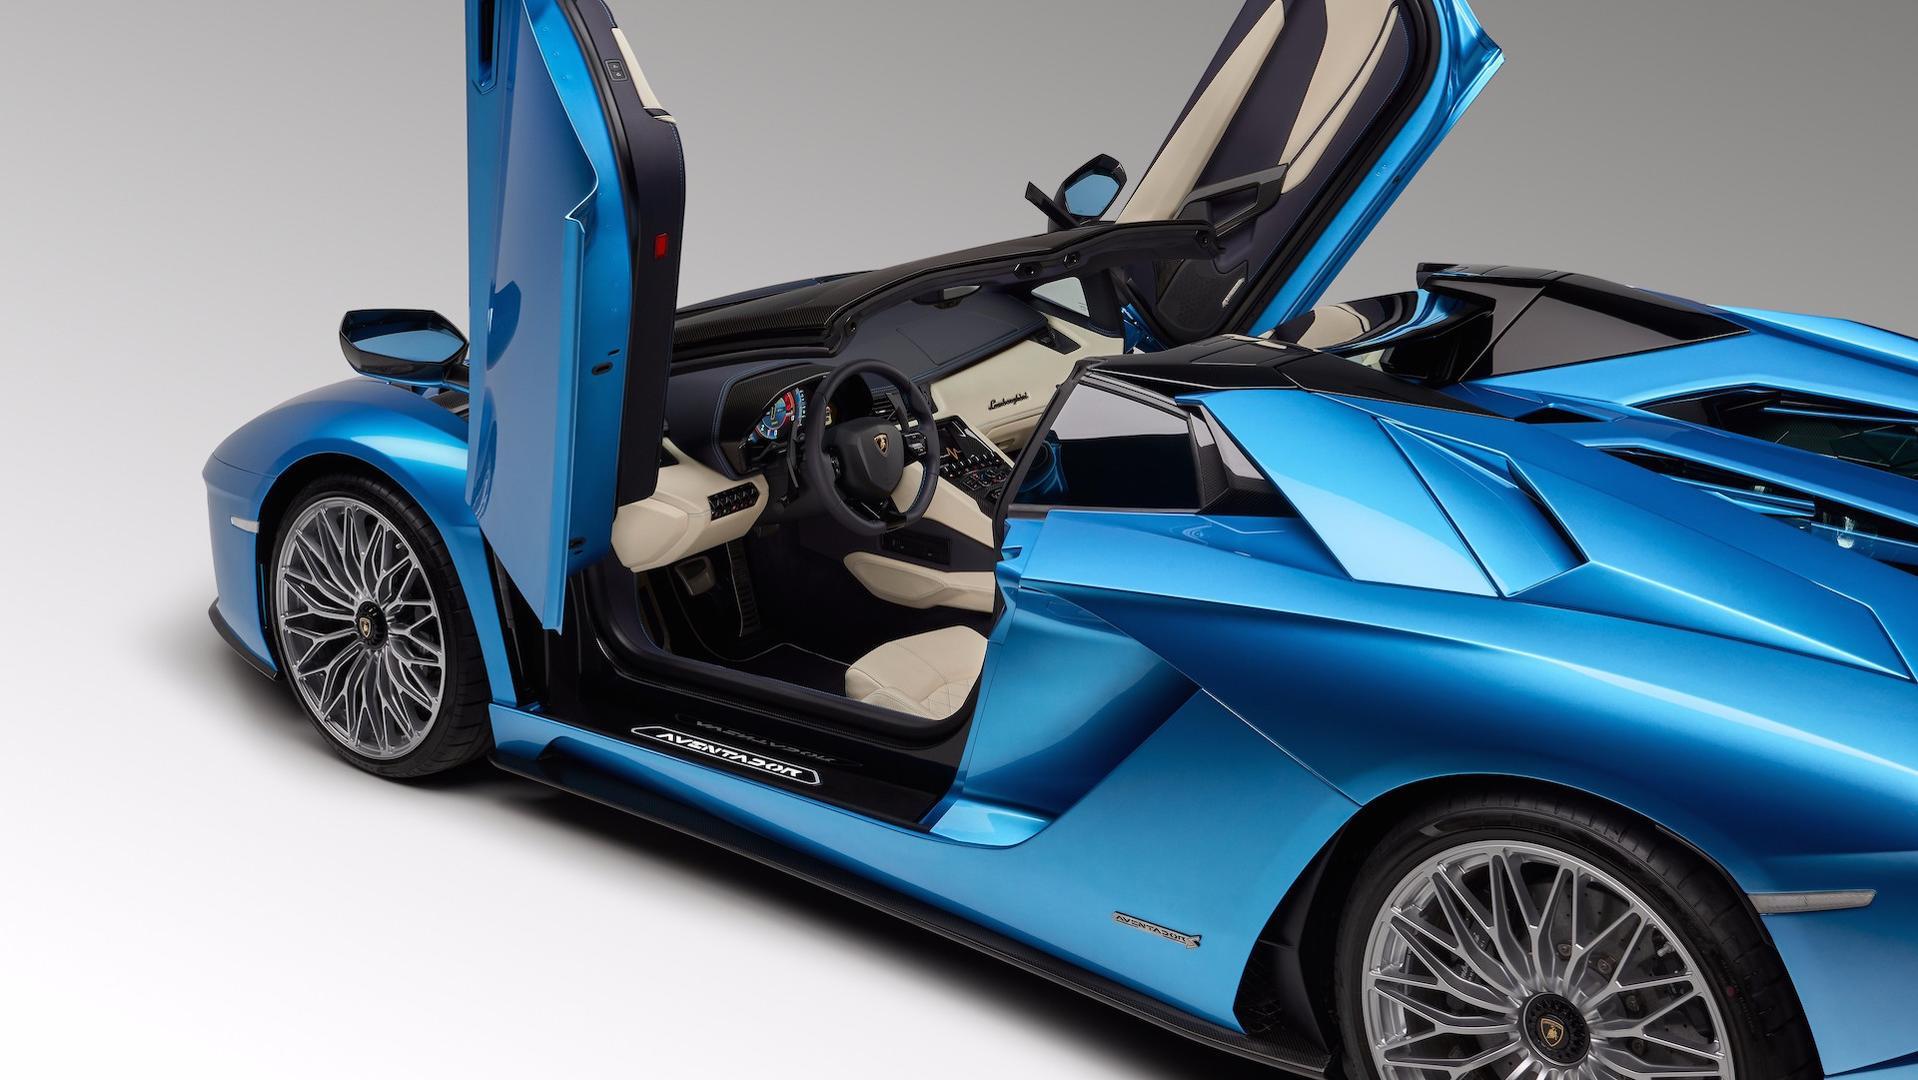 Lamborghini Says No To Rwd Aventador Water Is Still Wet Autoevolution